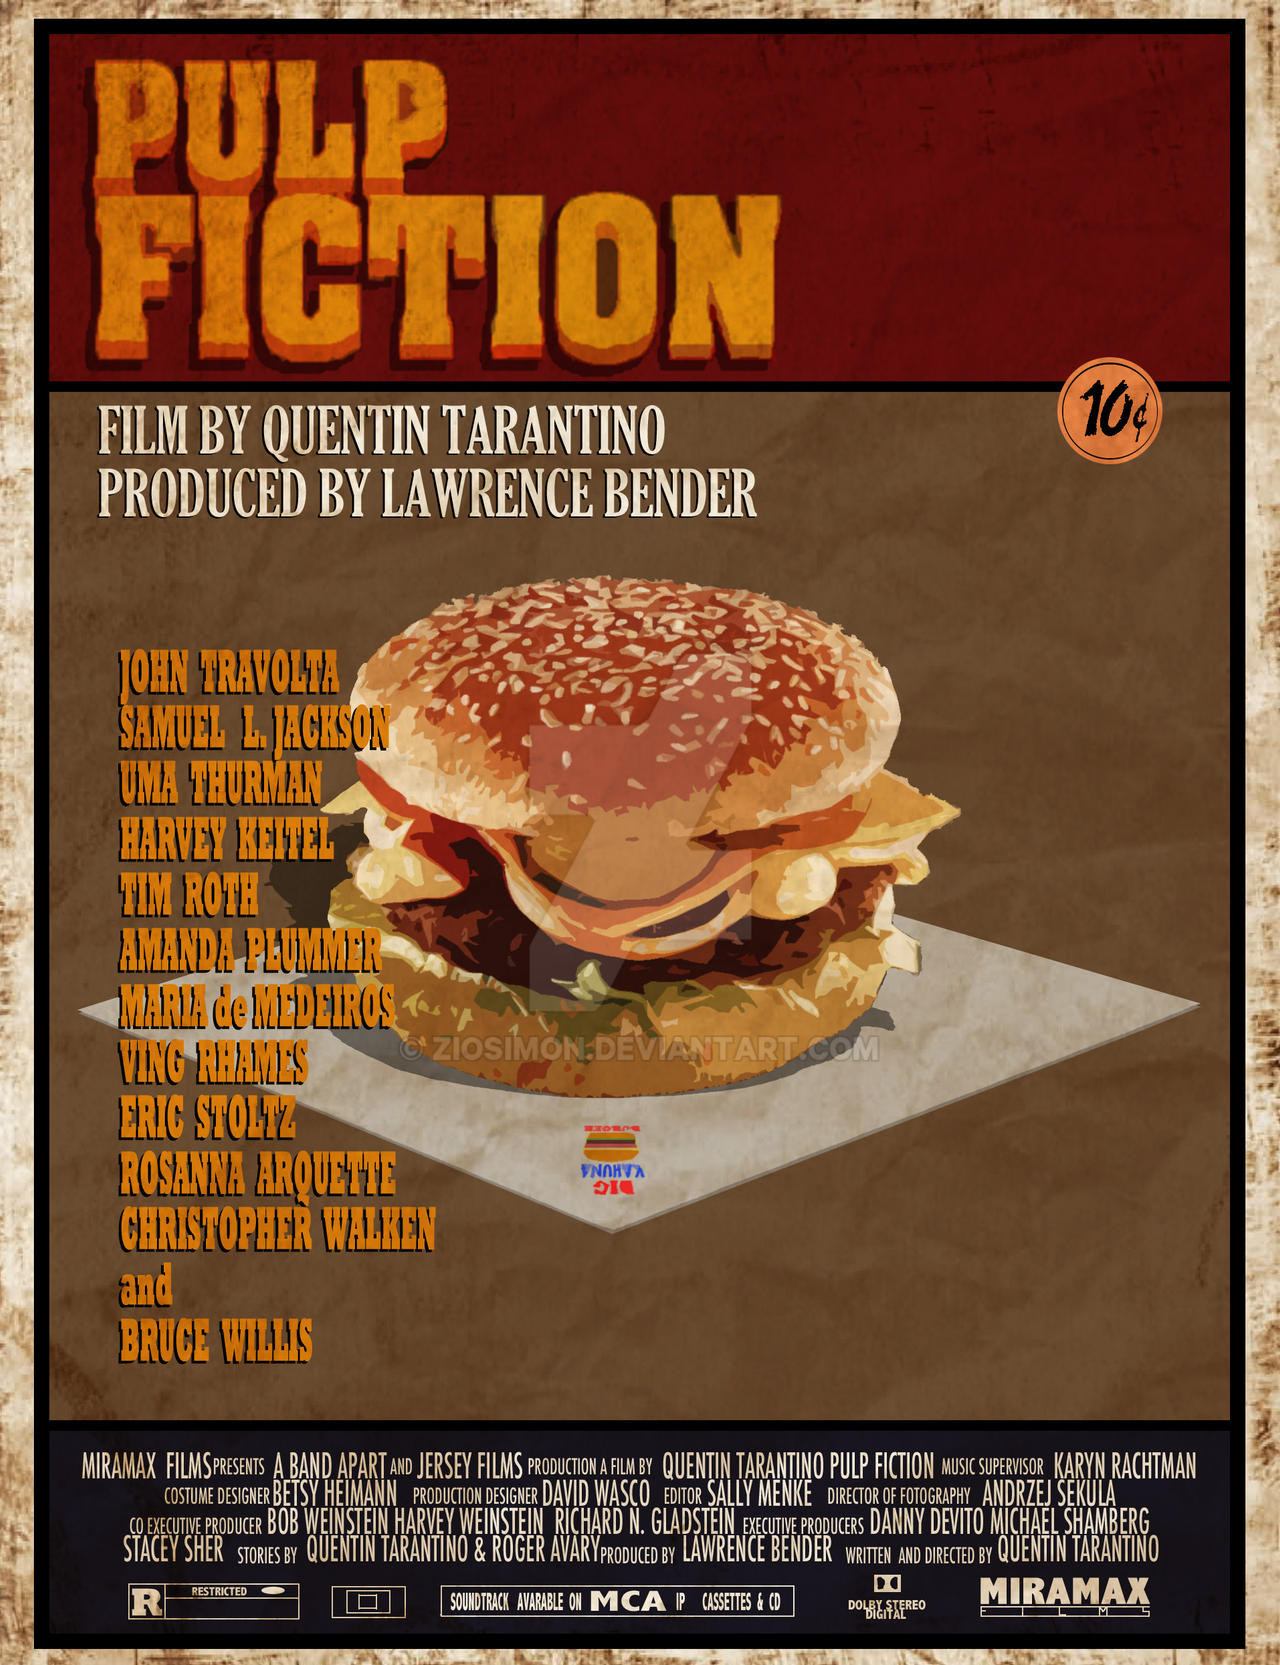 MOVIE FOOD - PULP FICTION by ziosimon